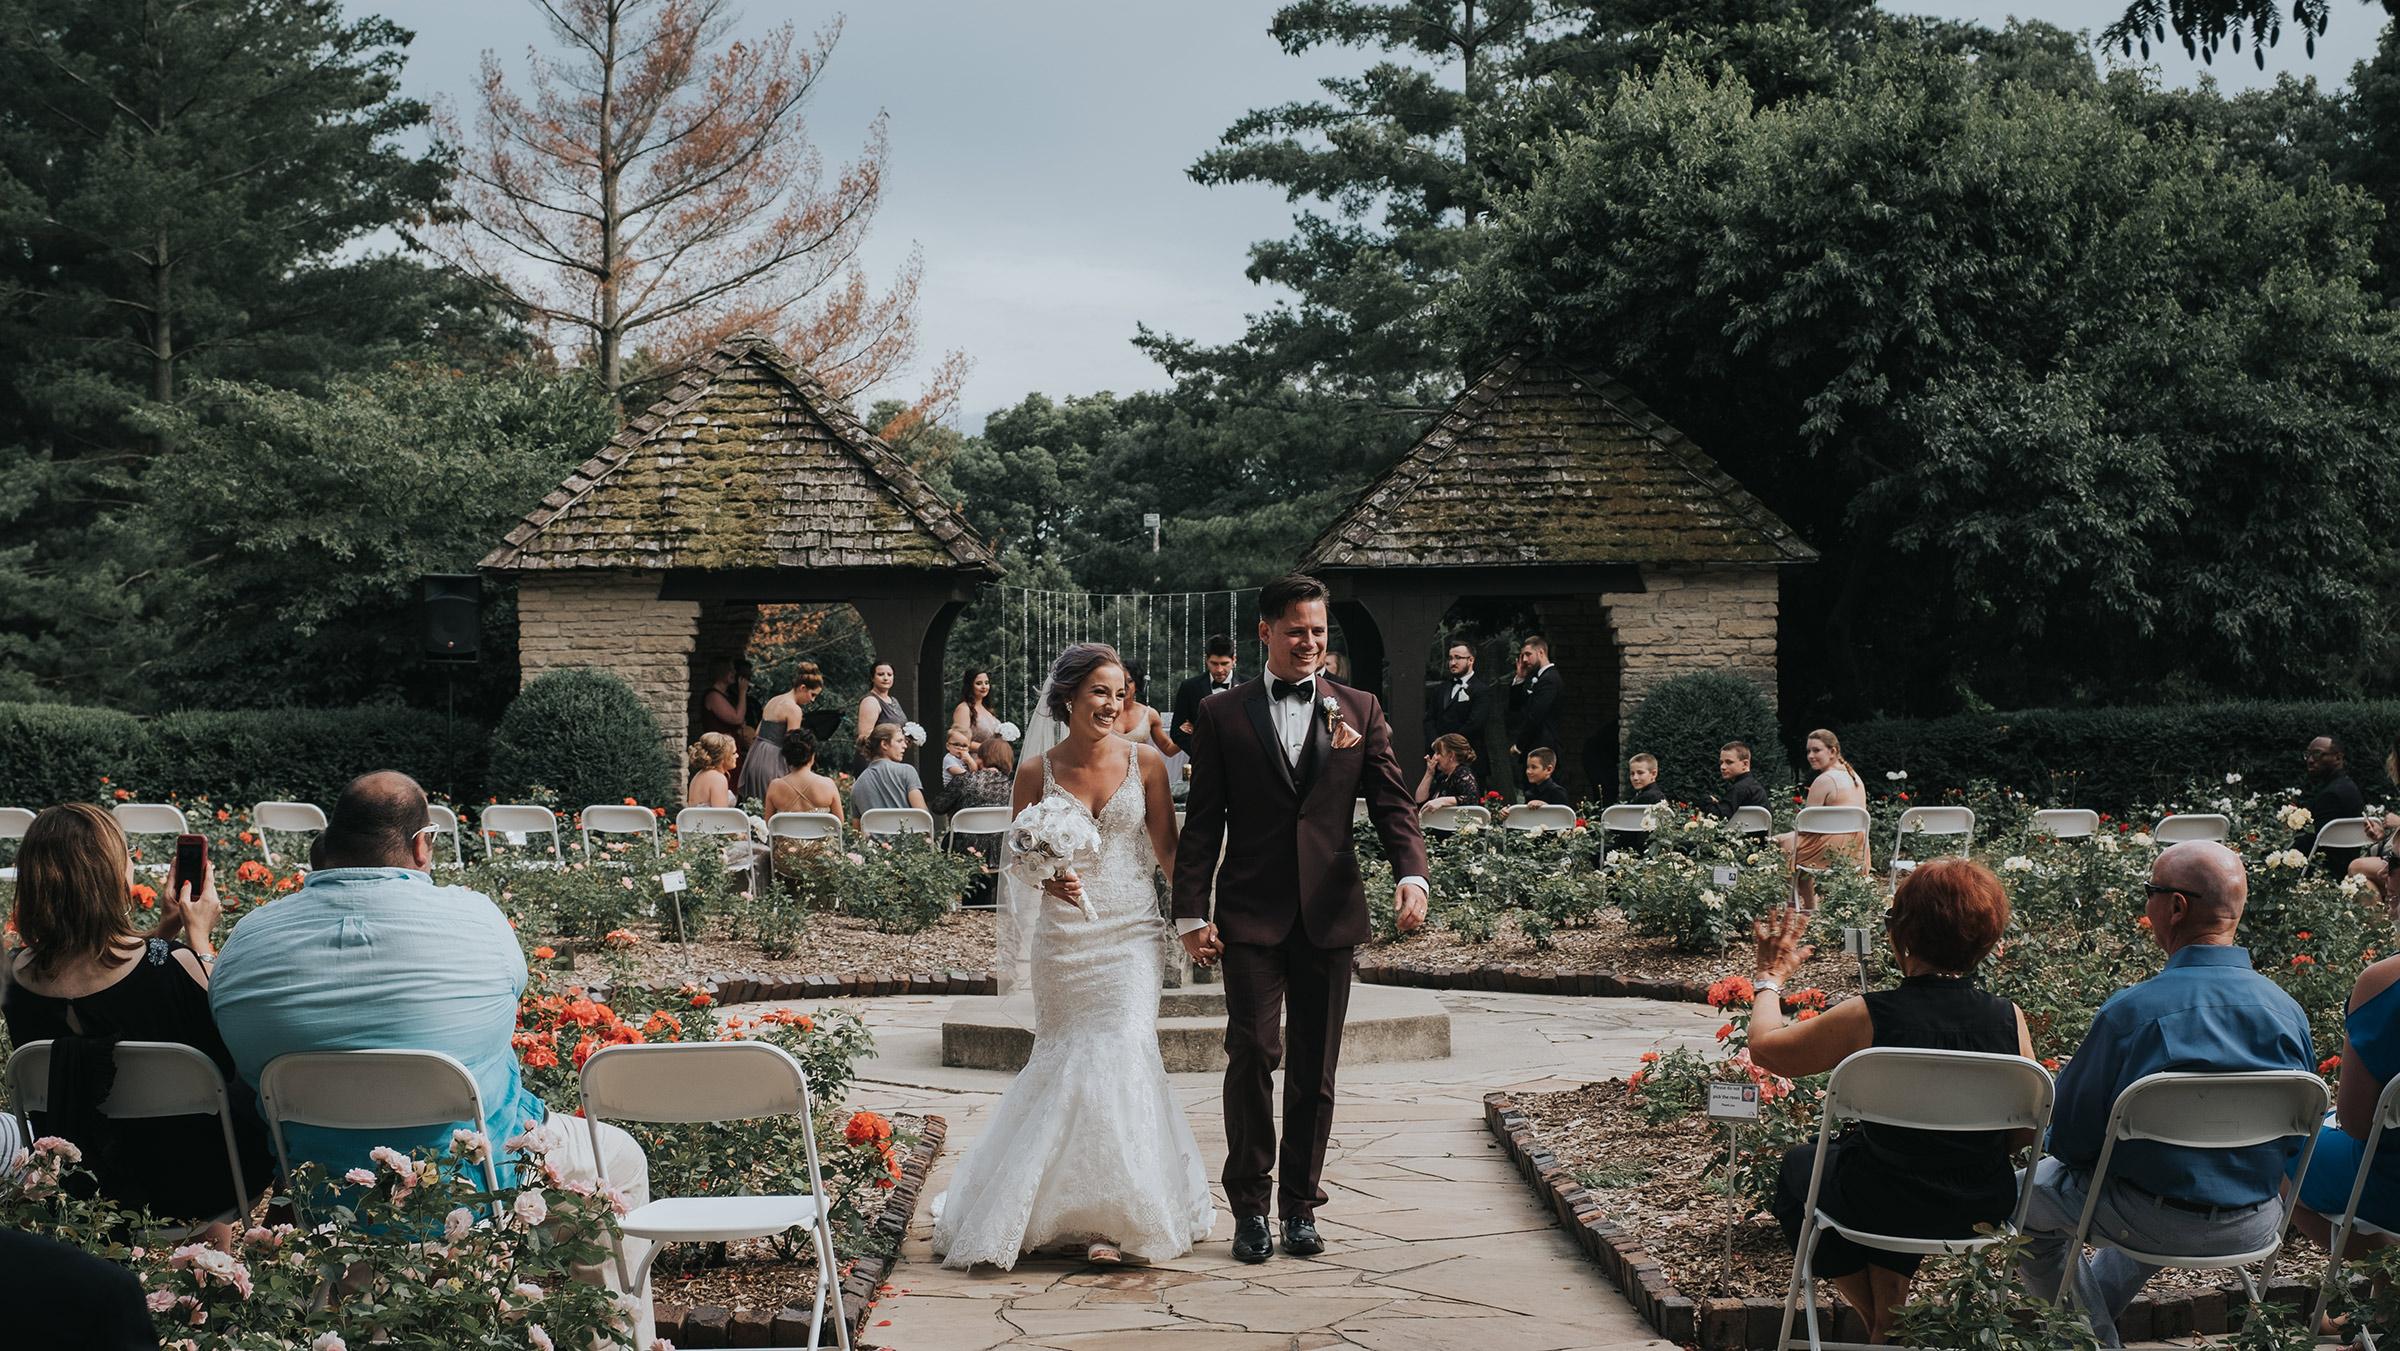 wedding-couple-walking-down-aisle-after-ceremony-desmoines-iowa-rose-garden-raelyn-ramey-photography.jpg